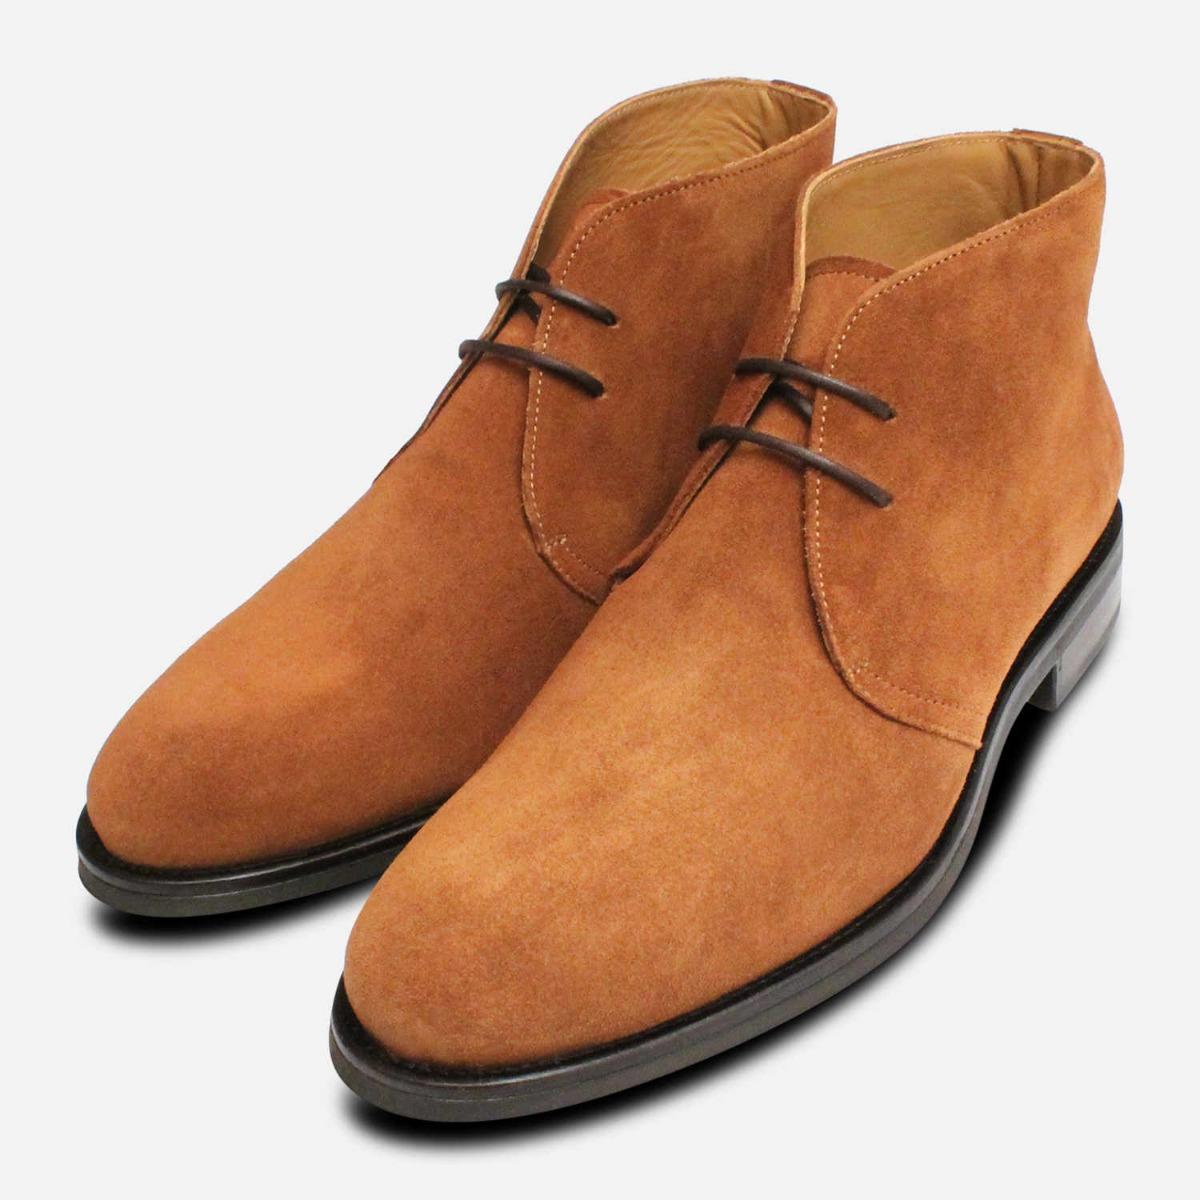 28ba19a189f Cognac Suede Westbury 5 John White Ankle Boots | eBay